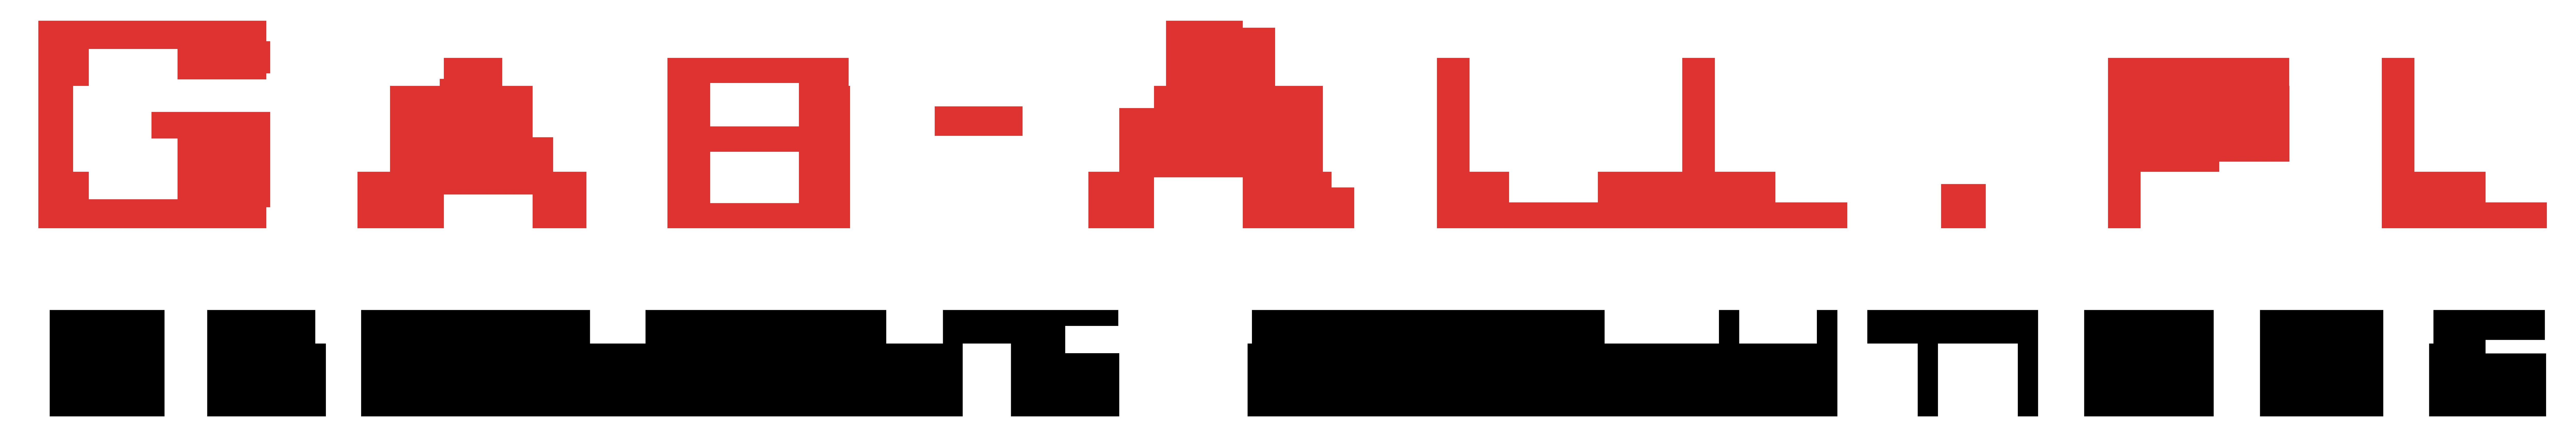 logo jasne podgląd